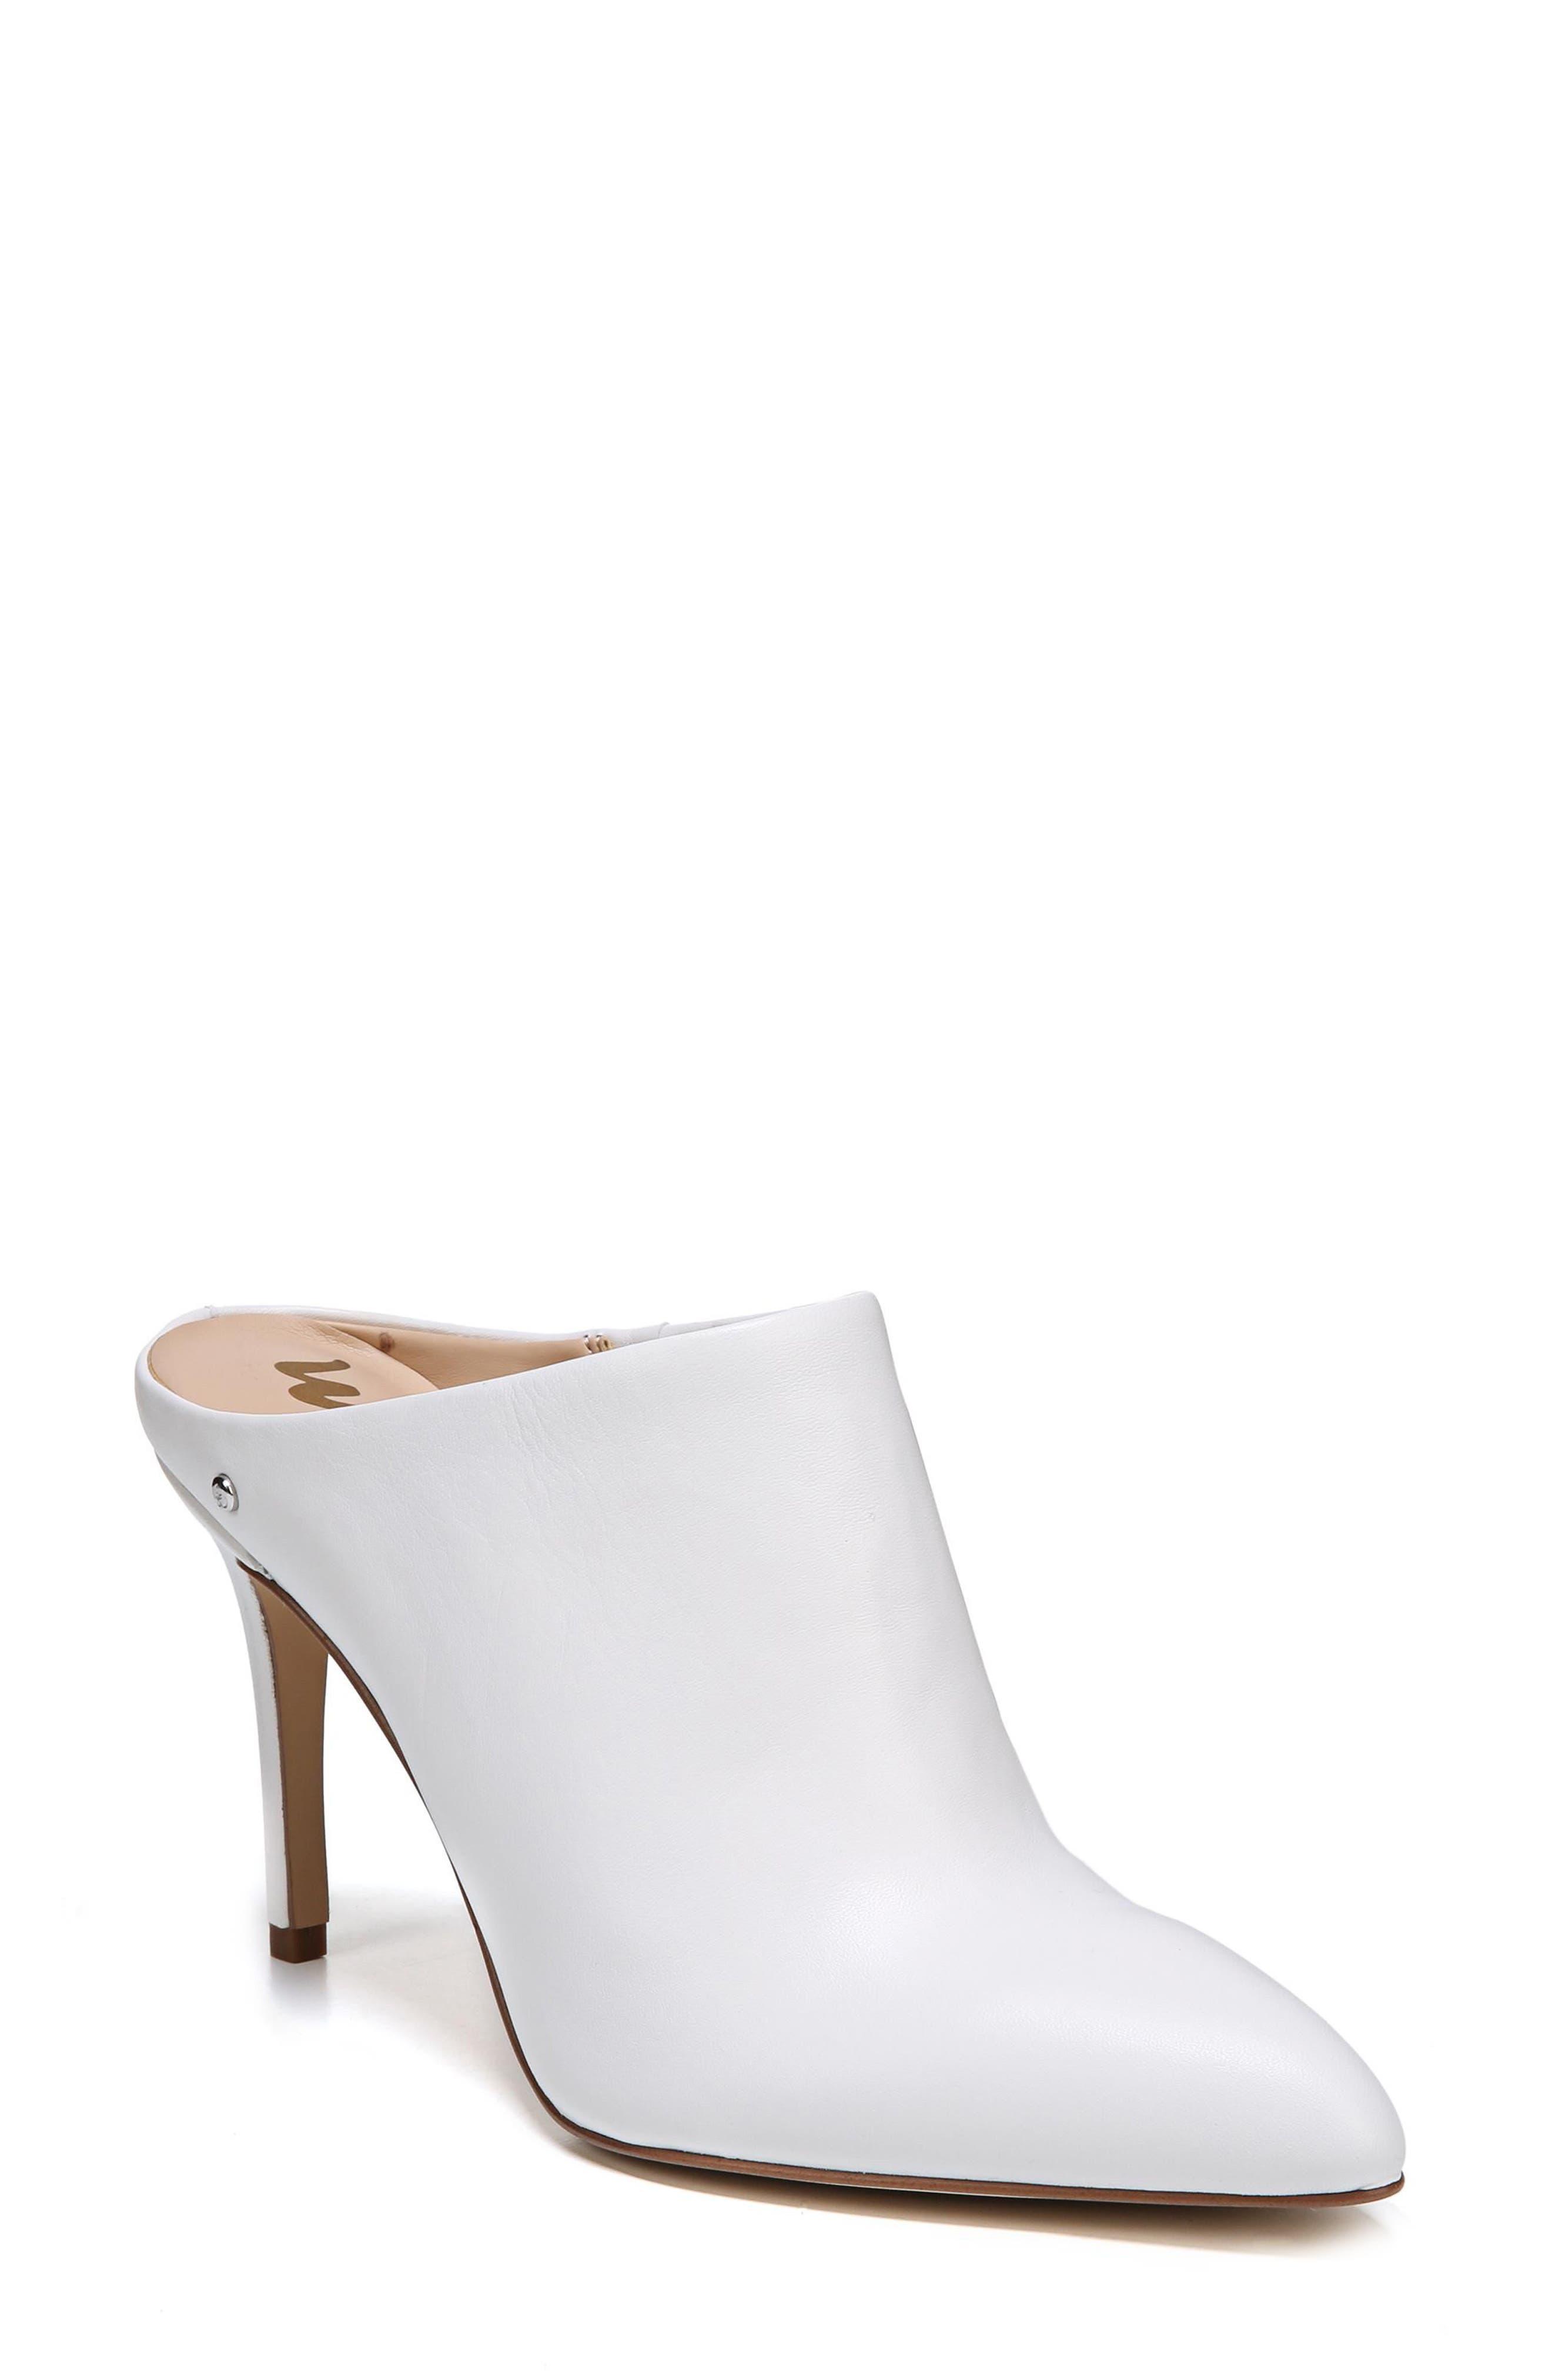 Oran Mule,                             Main thumbnail 1, color,                             Bright White Nappa Leather